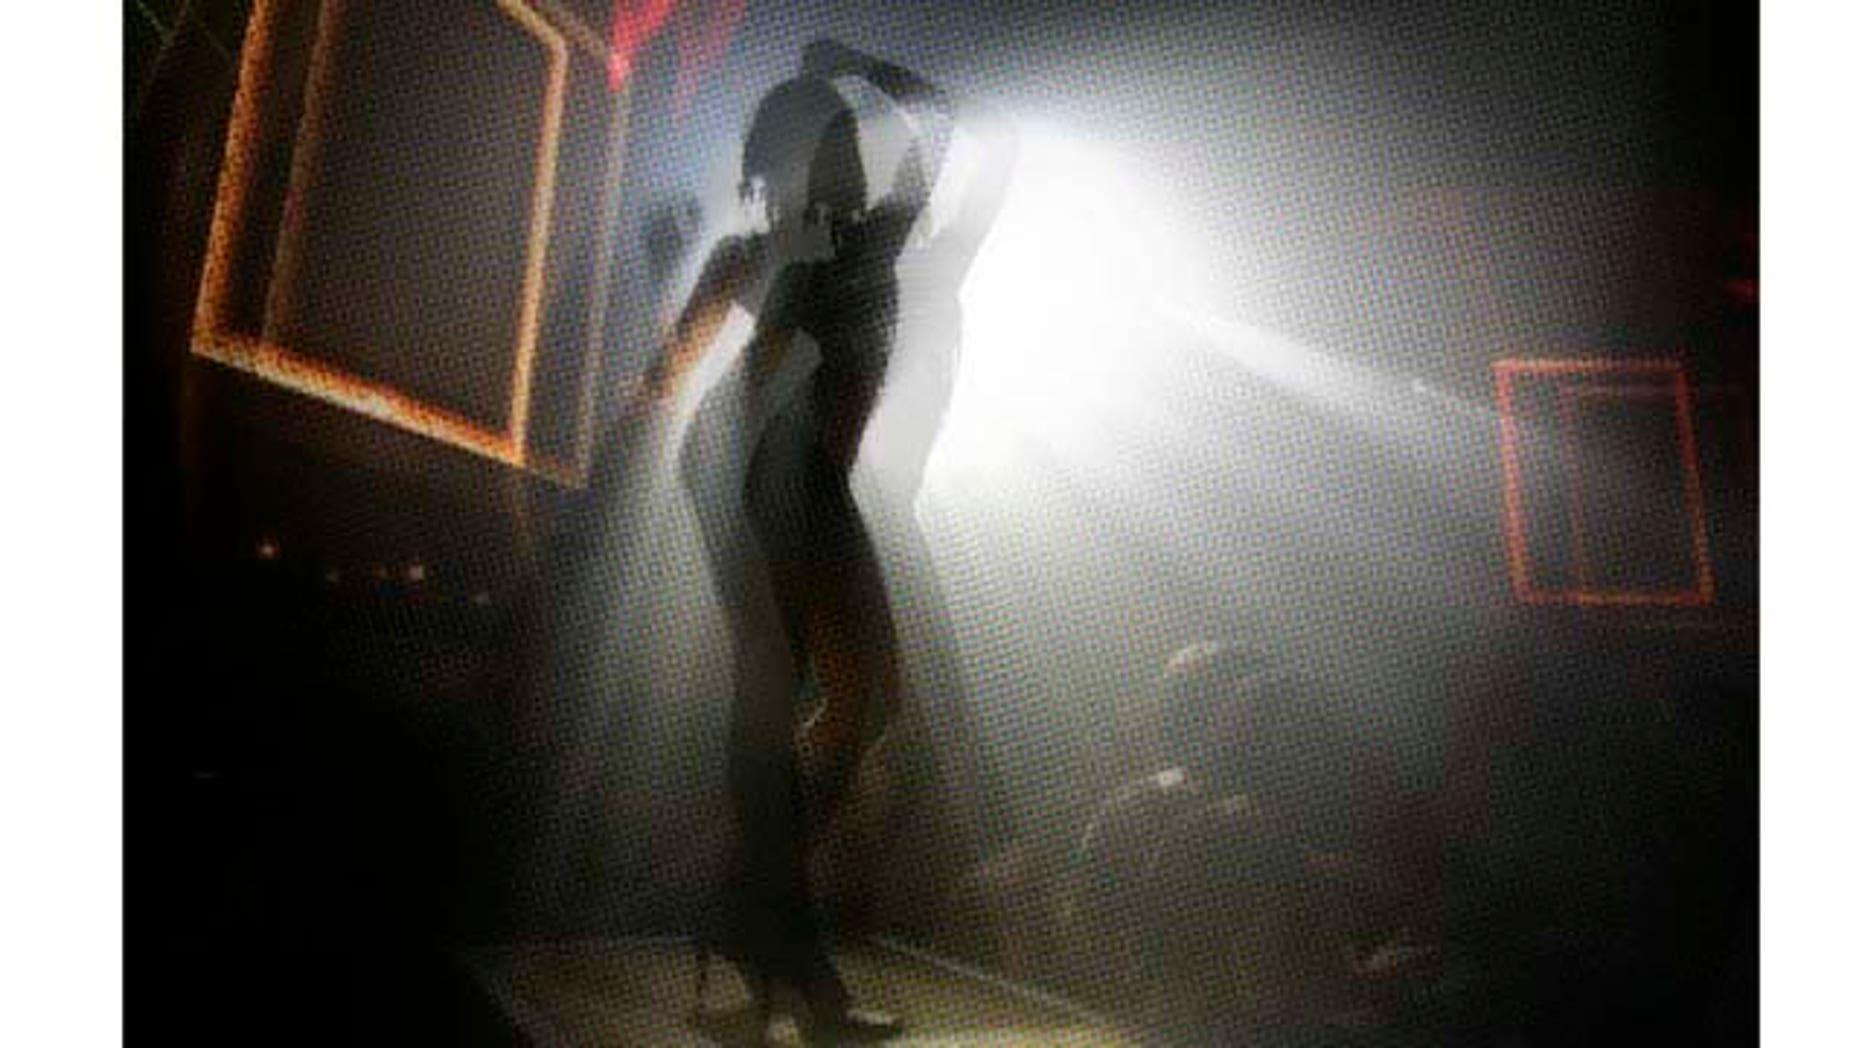 ** FOR IMMEDIATE RELEASE **A girl dances on a platform at the Mansion nightclub in Miami Beach, Fla., Nov. 10, 2006. (AP Photo/Lynne Sladky)